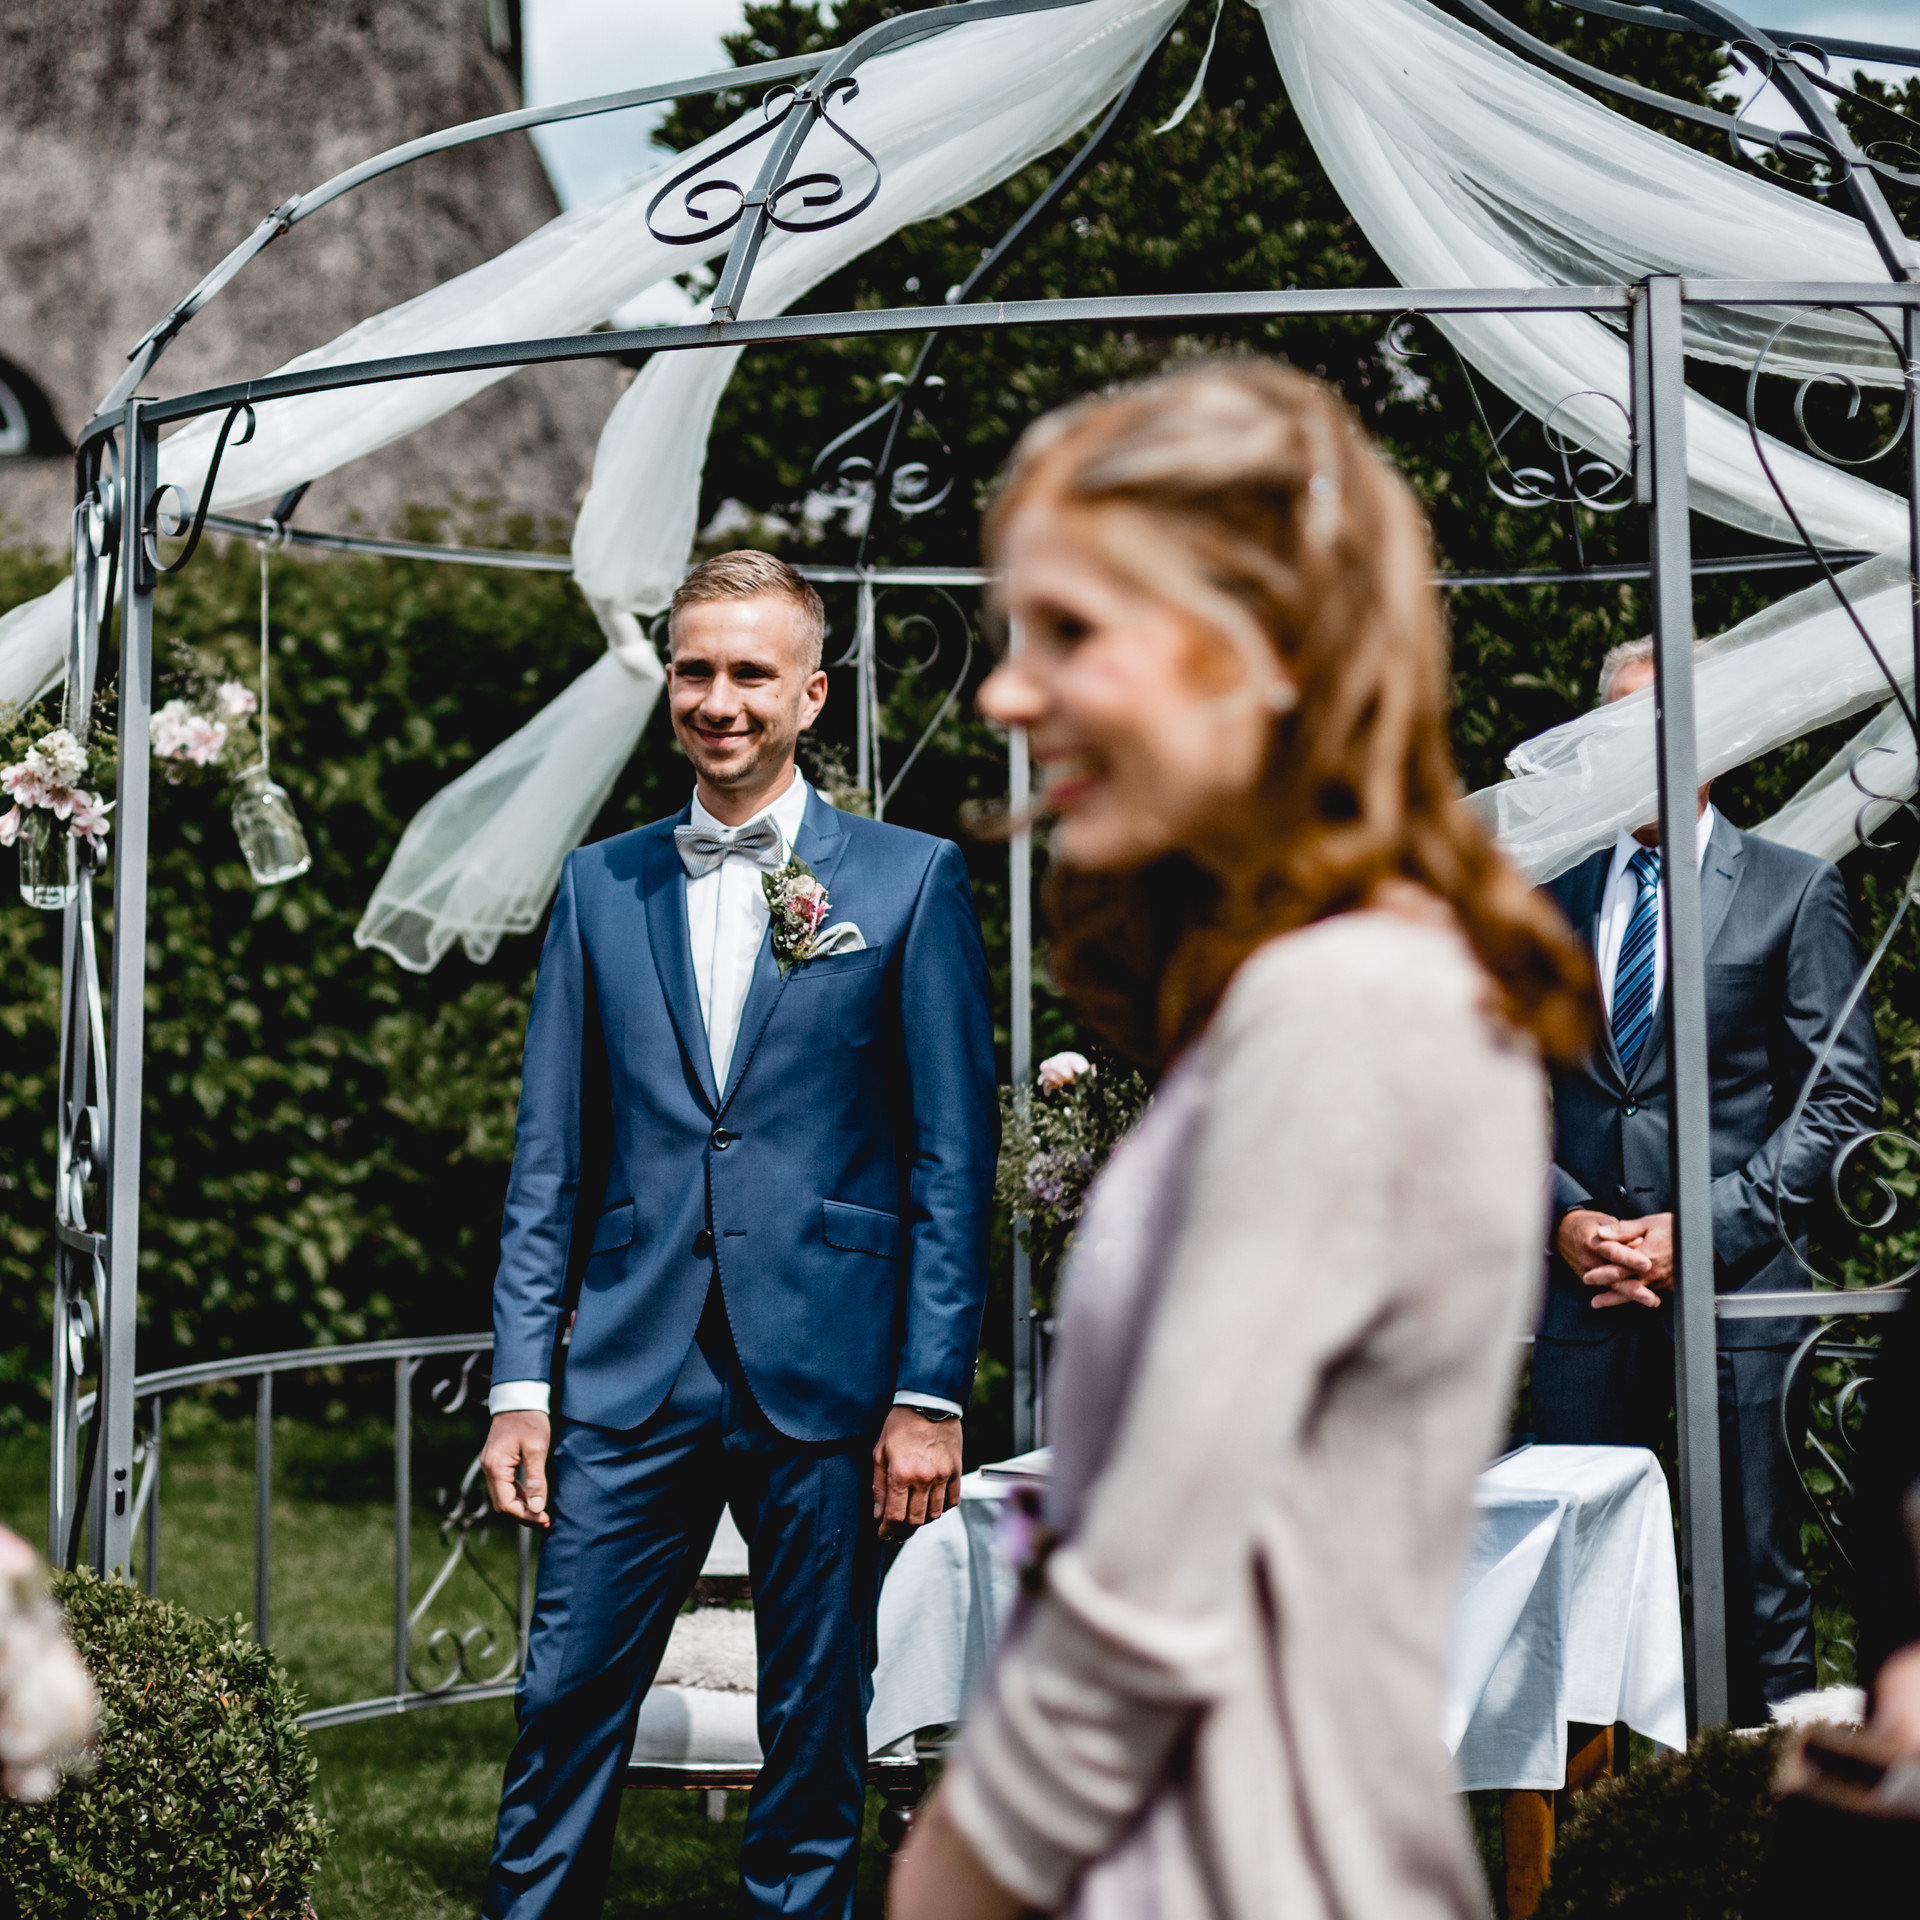 Hochzeit Ricarda & Jannik Donat-38.jpg